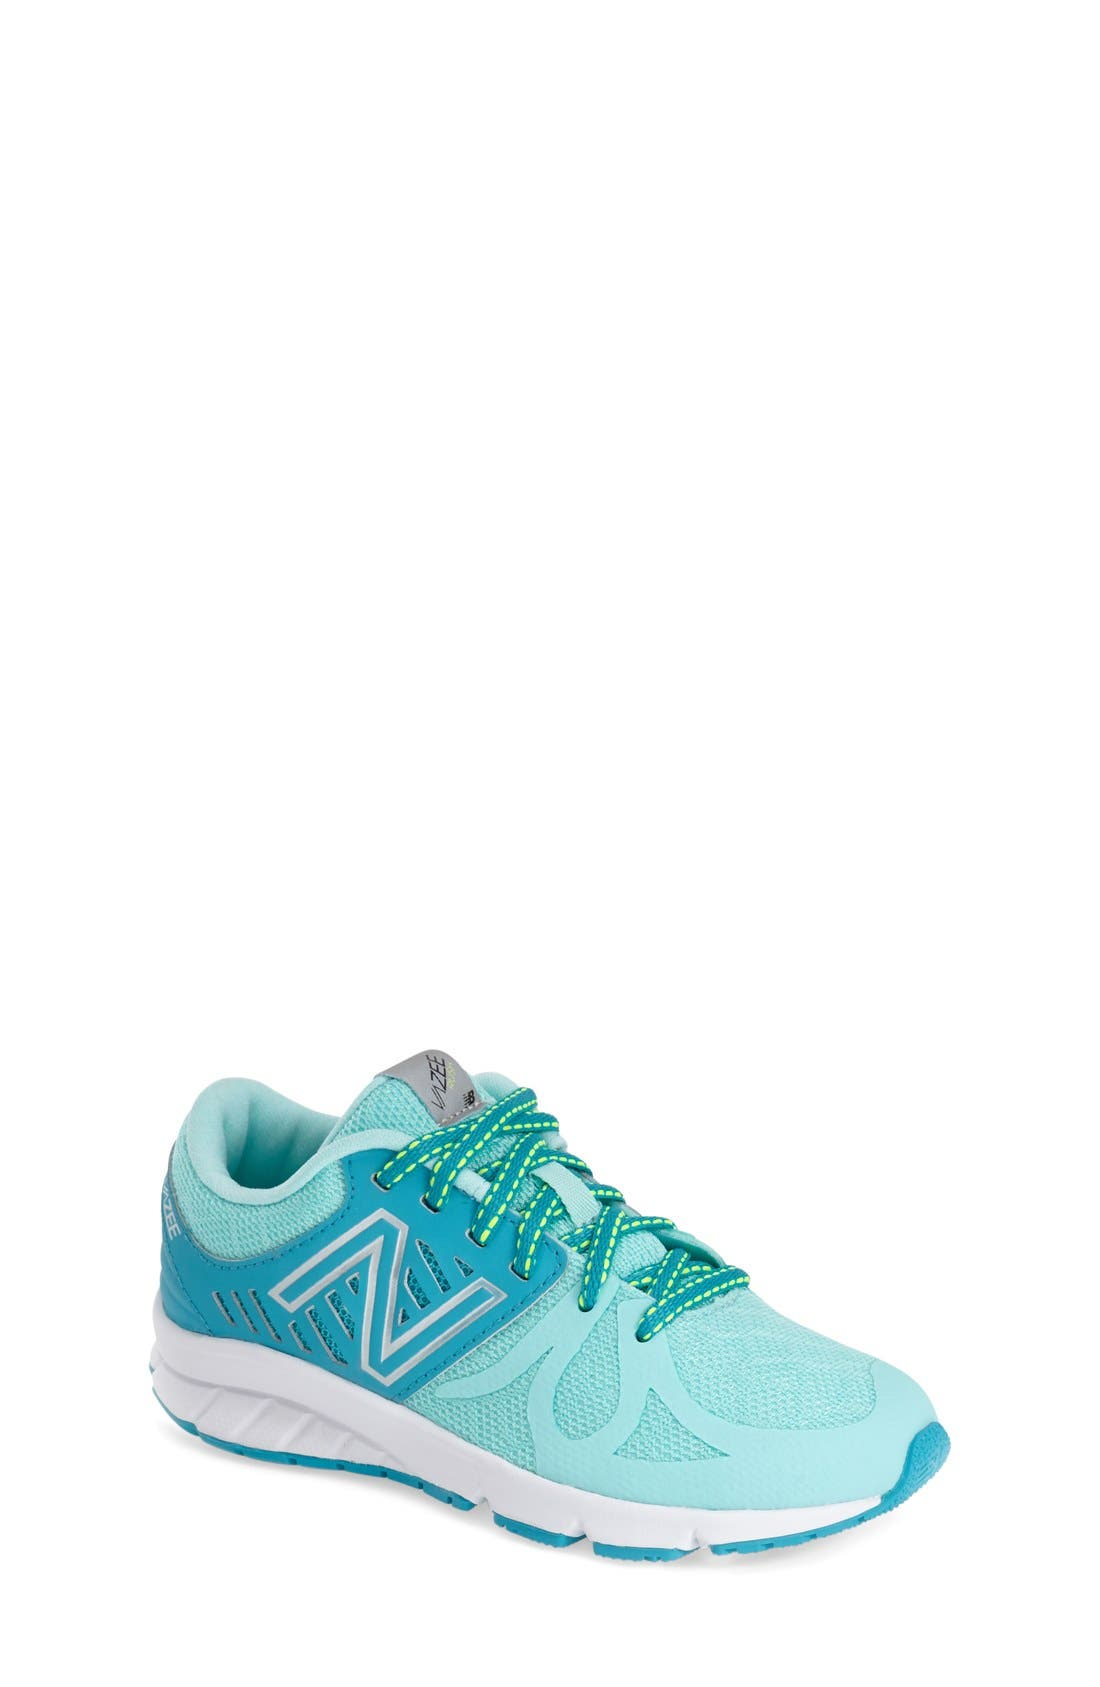 '200 Rush Vazee' Athletic Shoe,                             Main thumbnail 1, color,                             Sea Glass